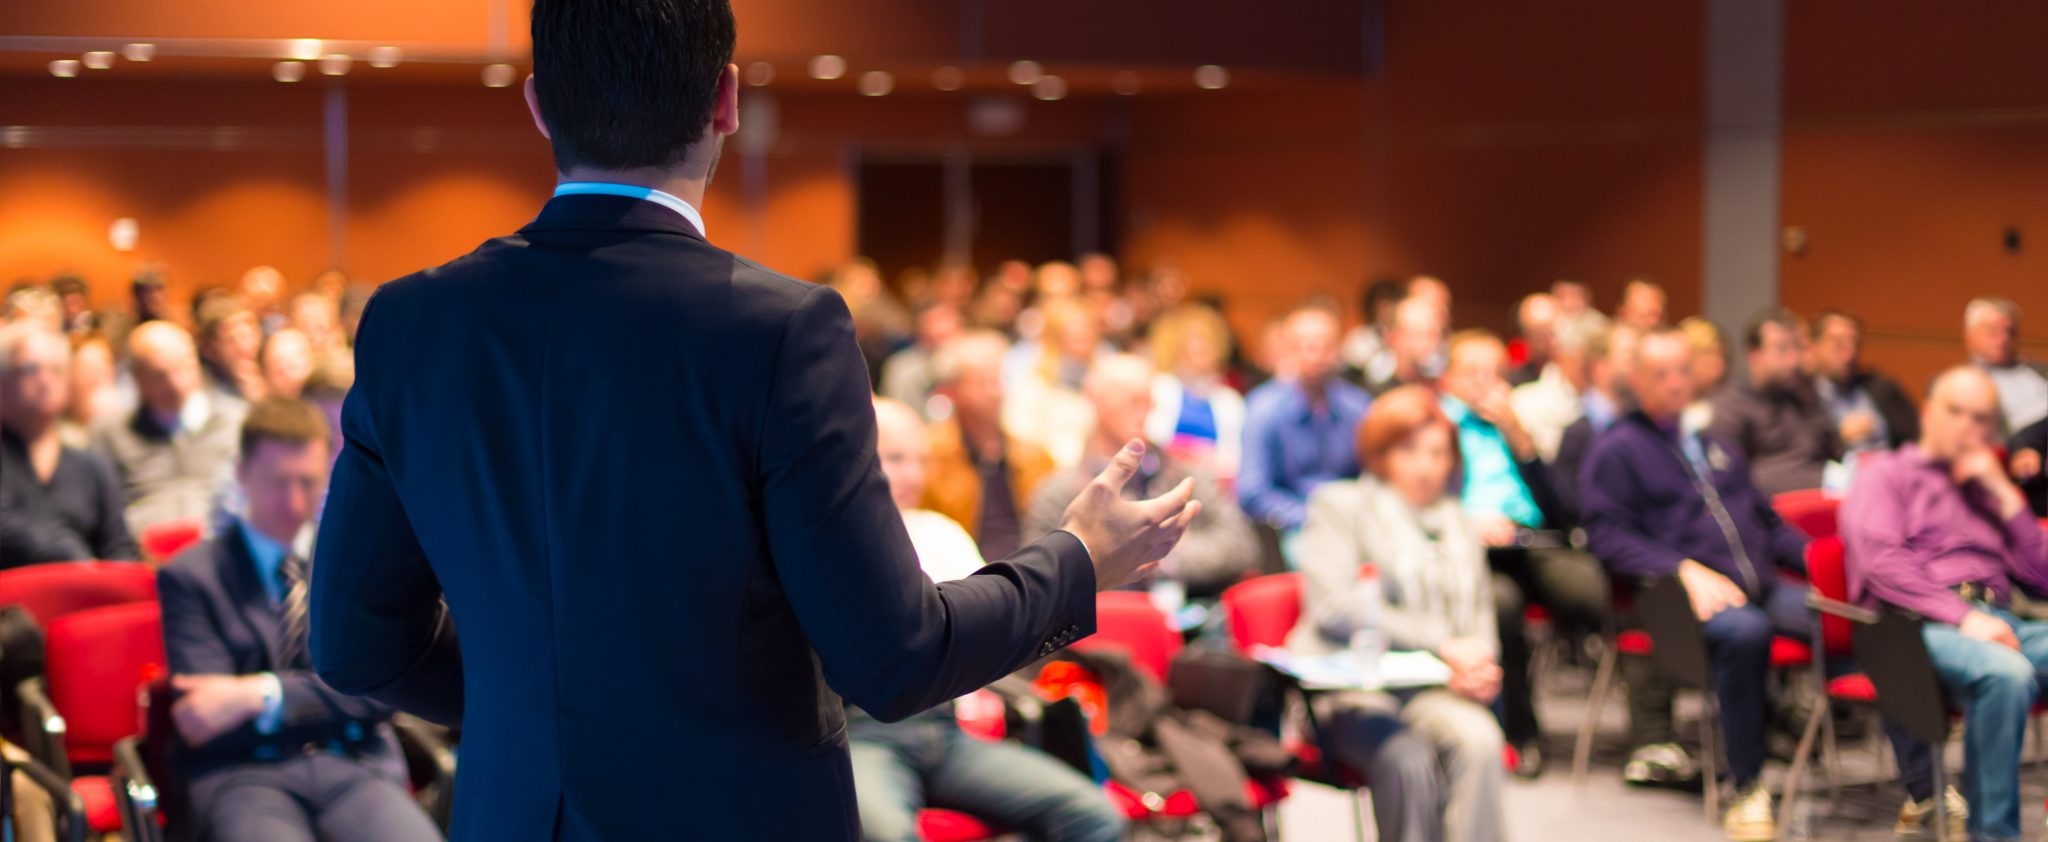 [عکس: How-to-get-the-most-out-of-conferences.jpg]